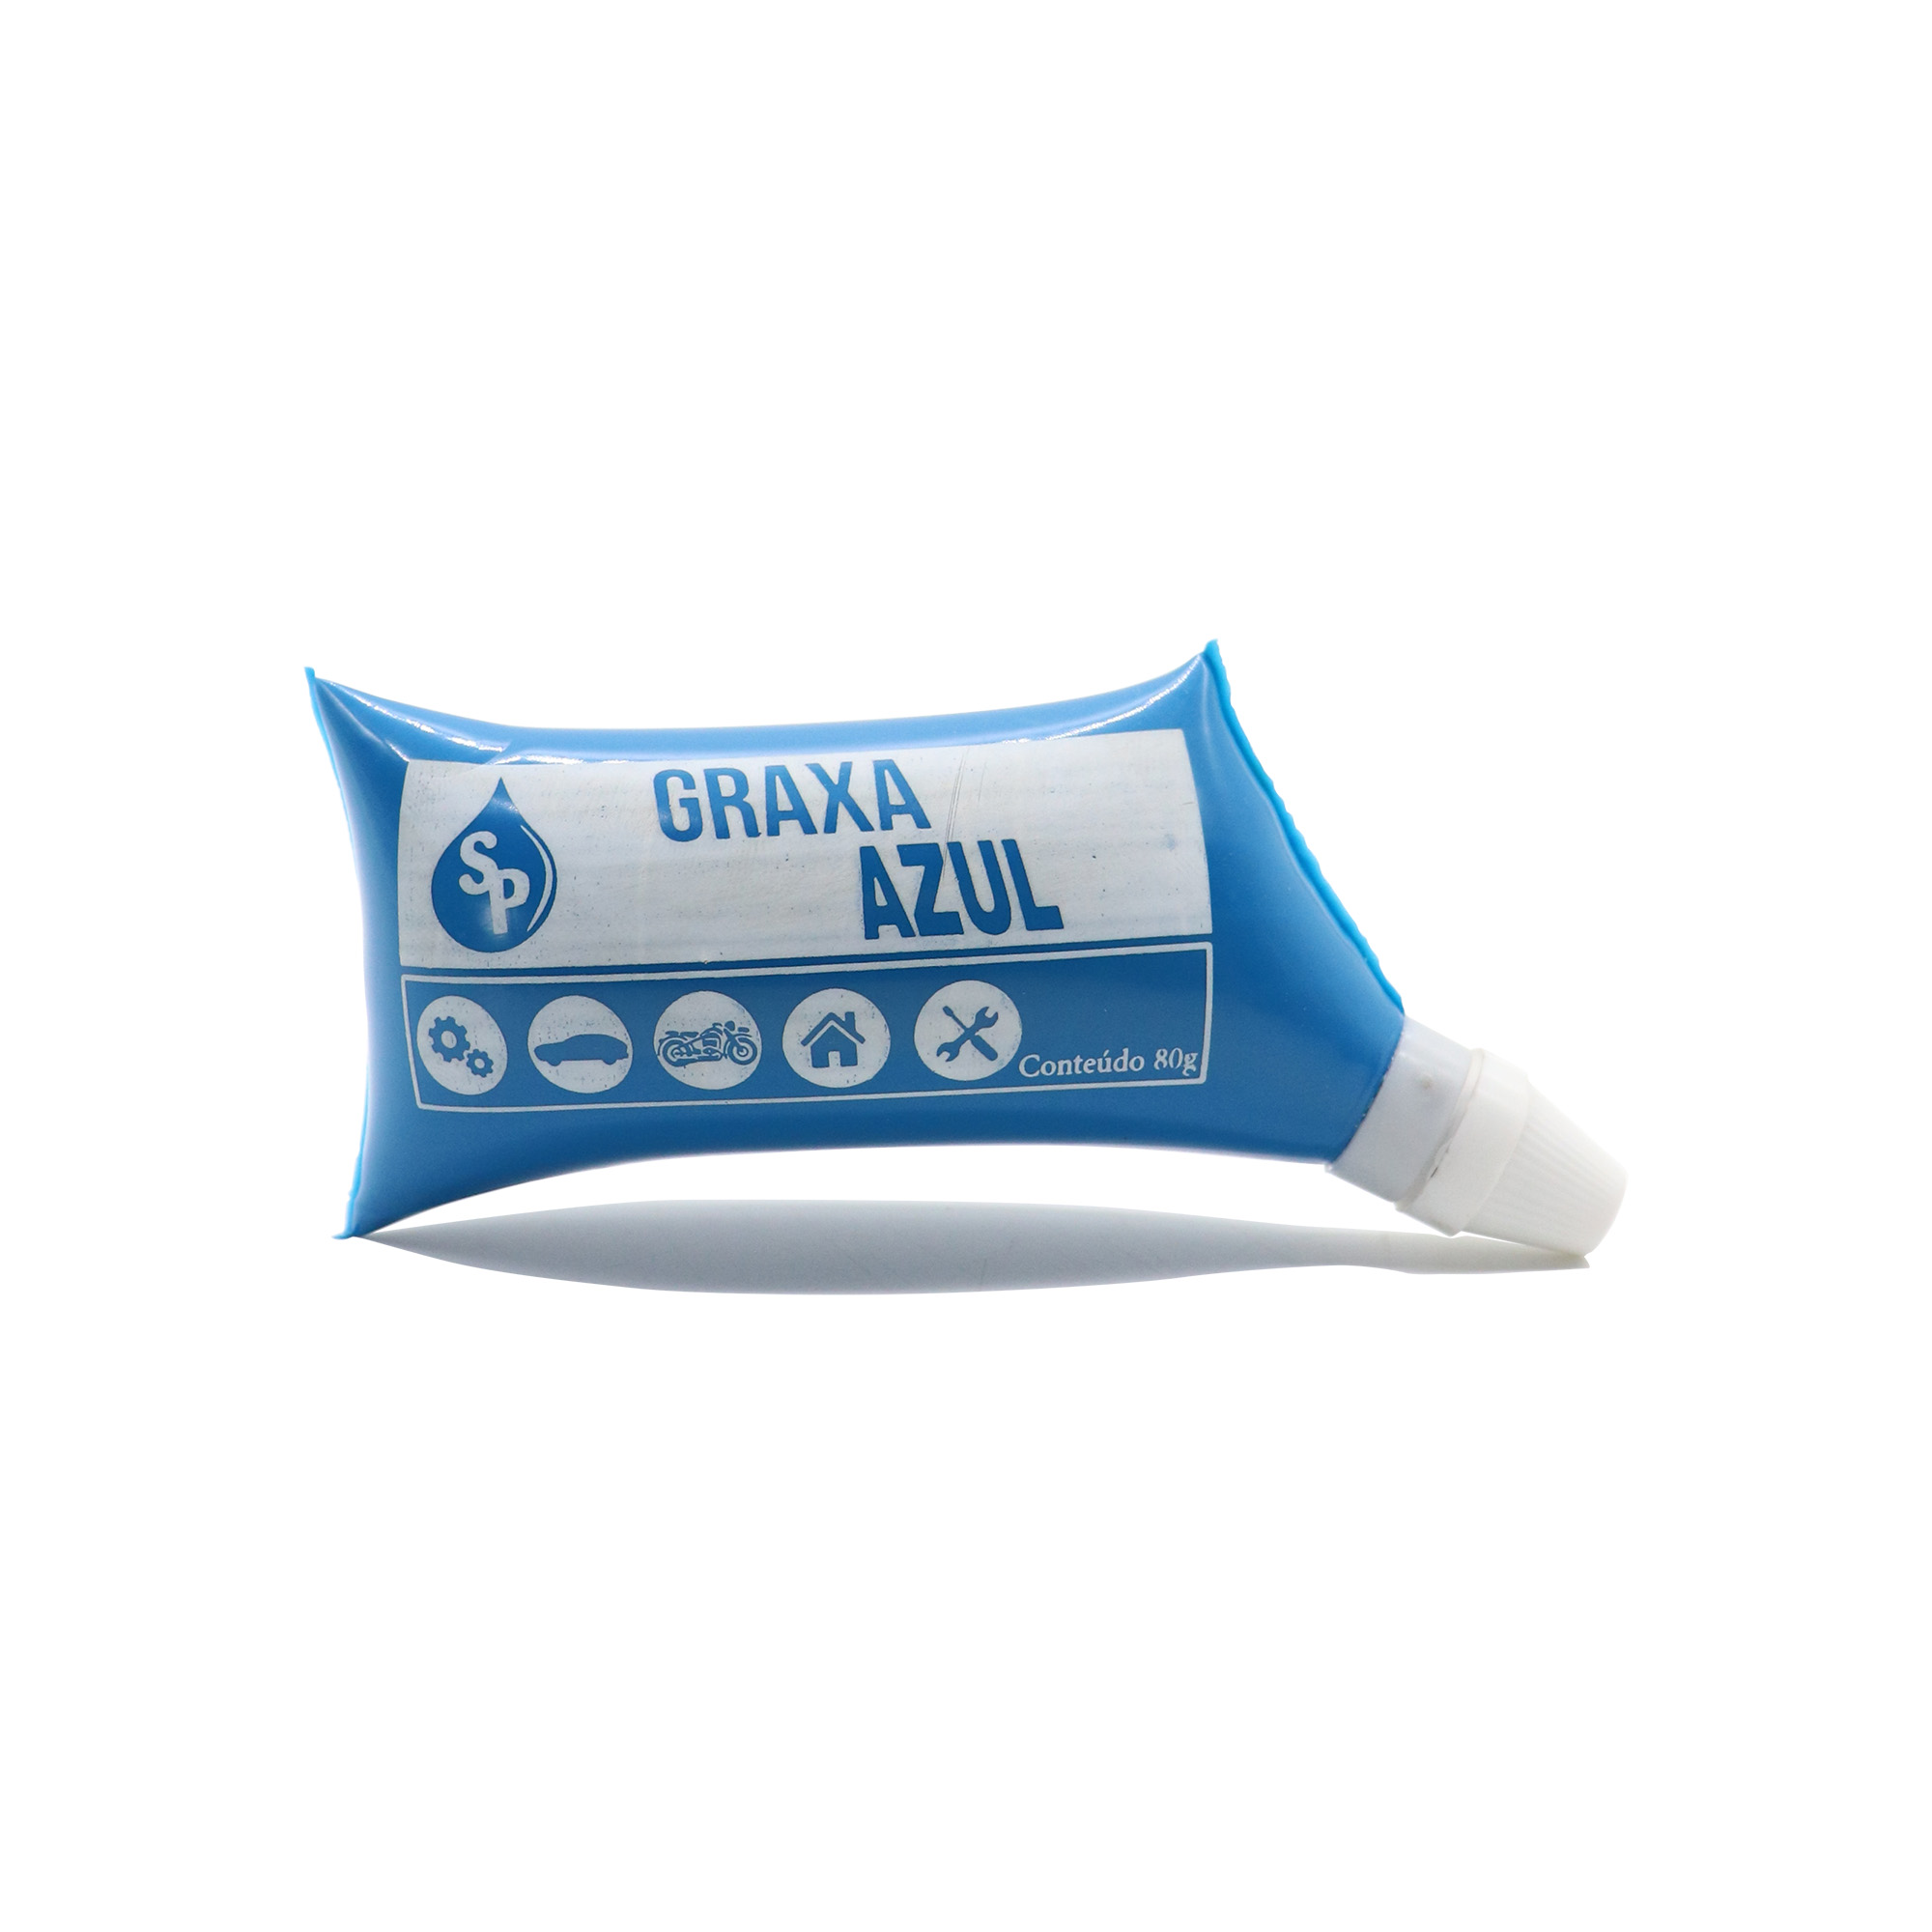 Graxa Azul 80g